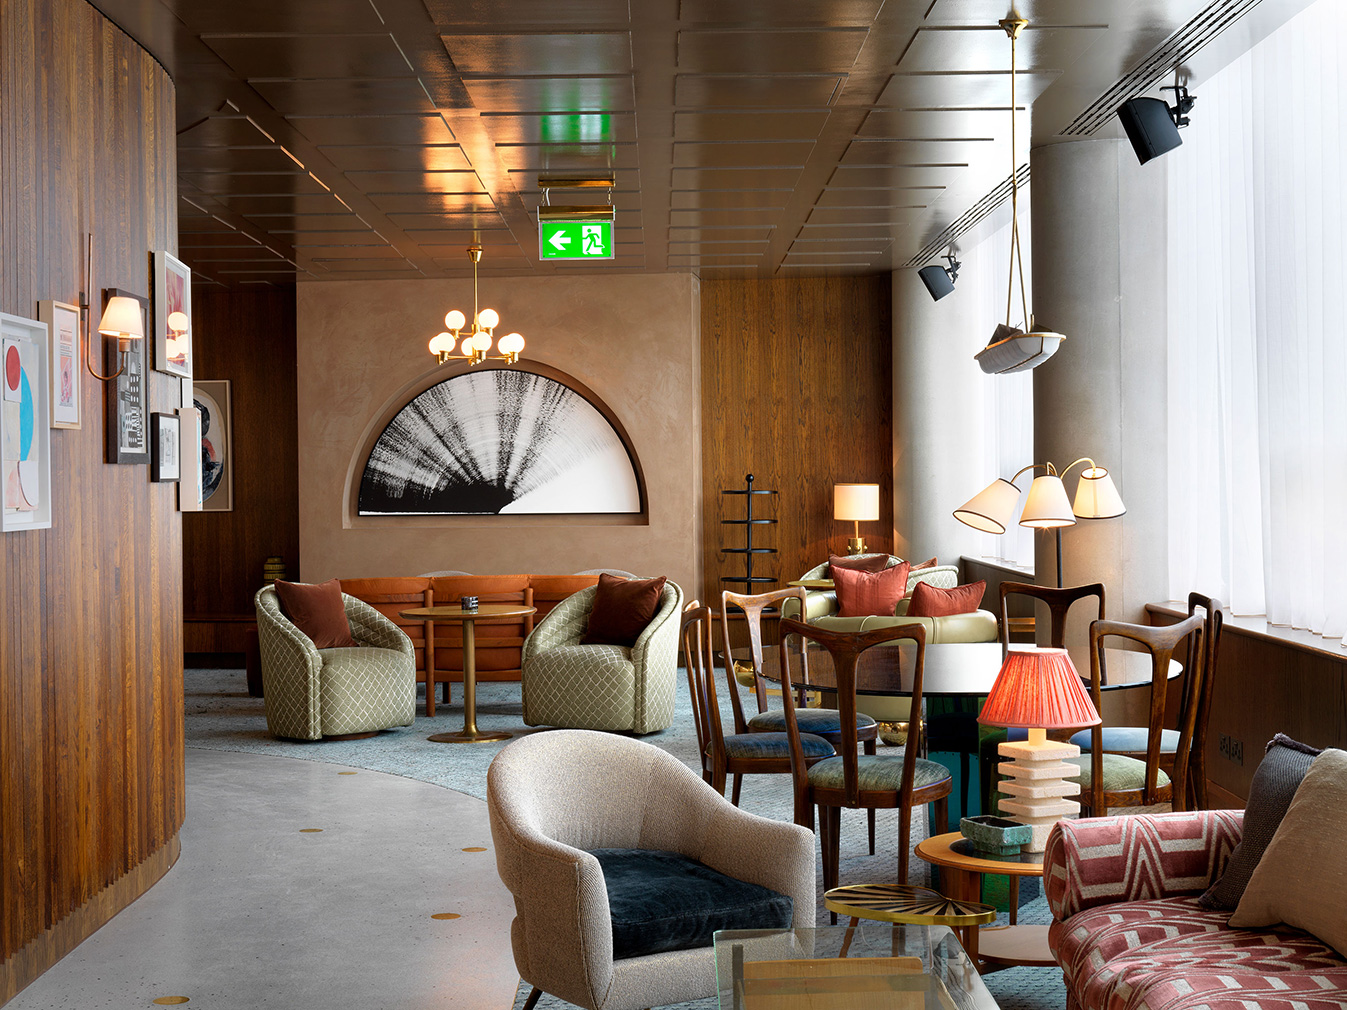 Peek inside the BBC Television Centre's White City House